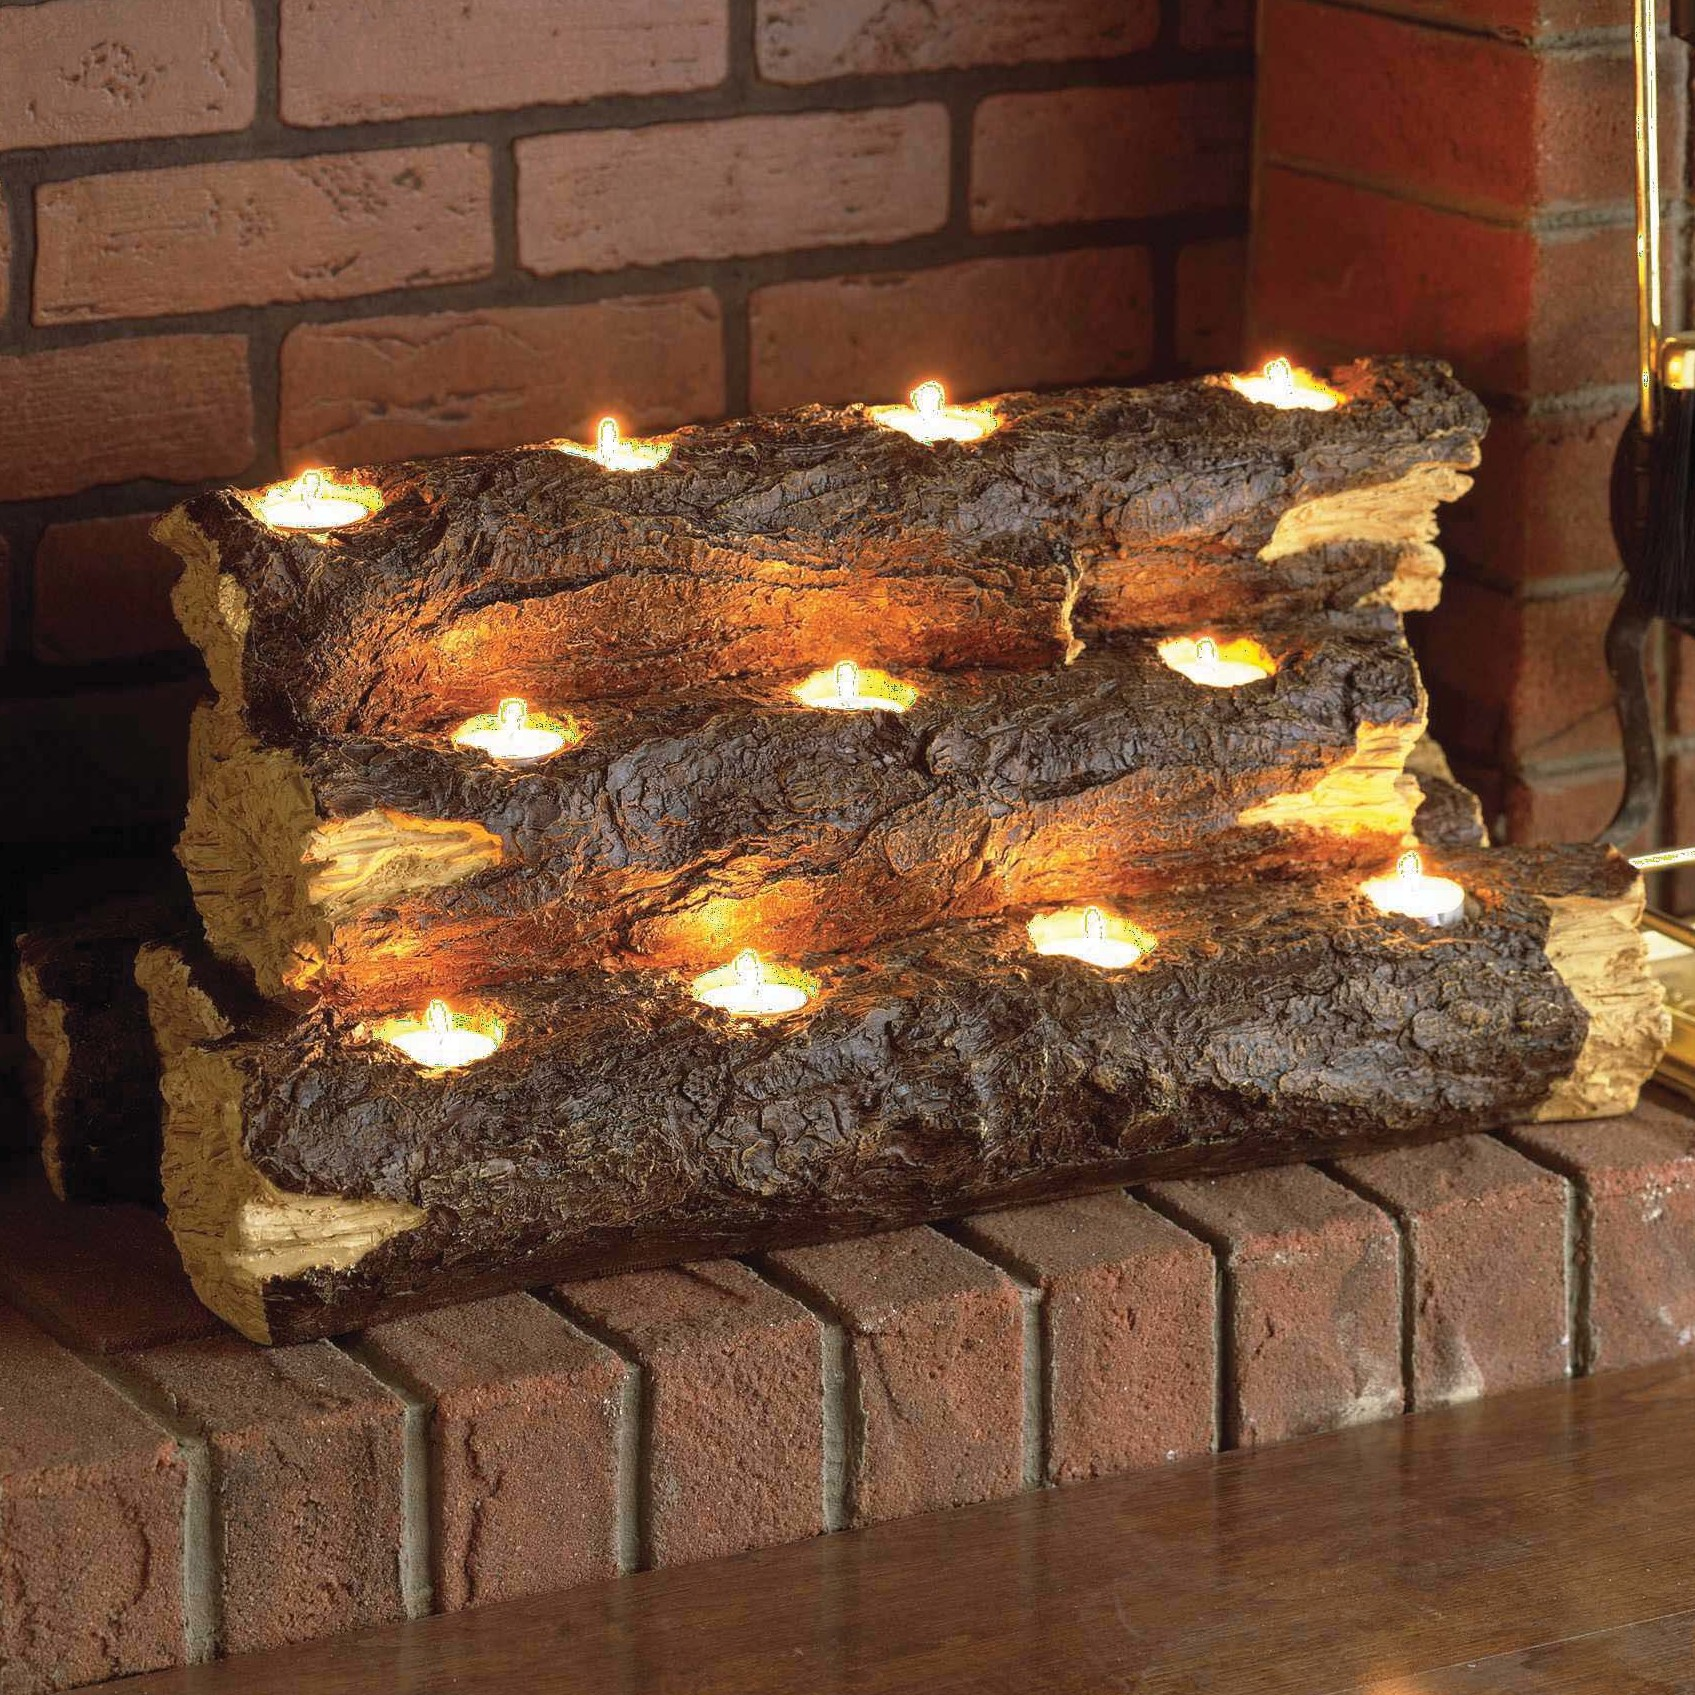 Free Shipping. Buy Wildon Home  Resin Tealight Fireplace Log at Walmart.com